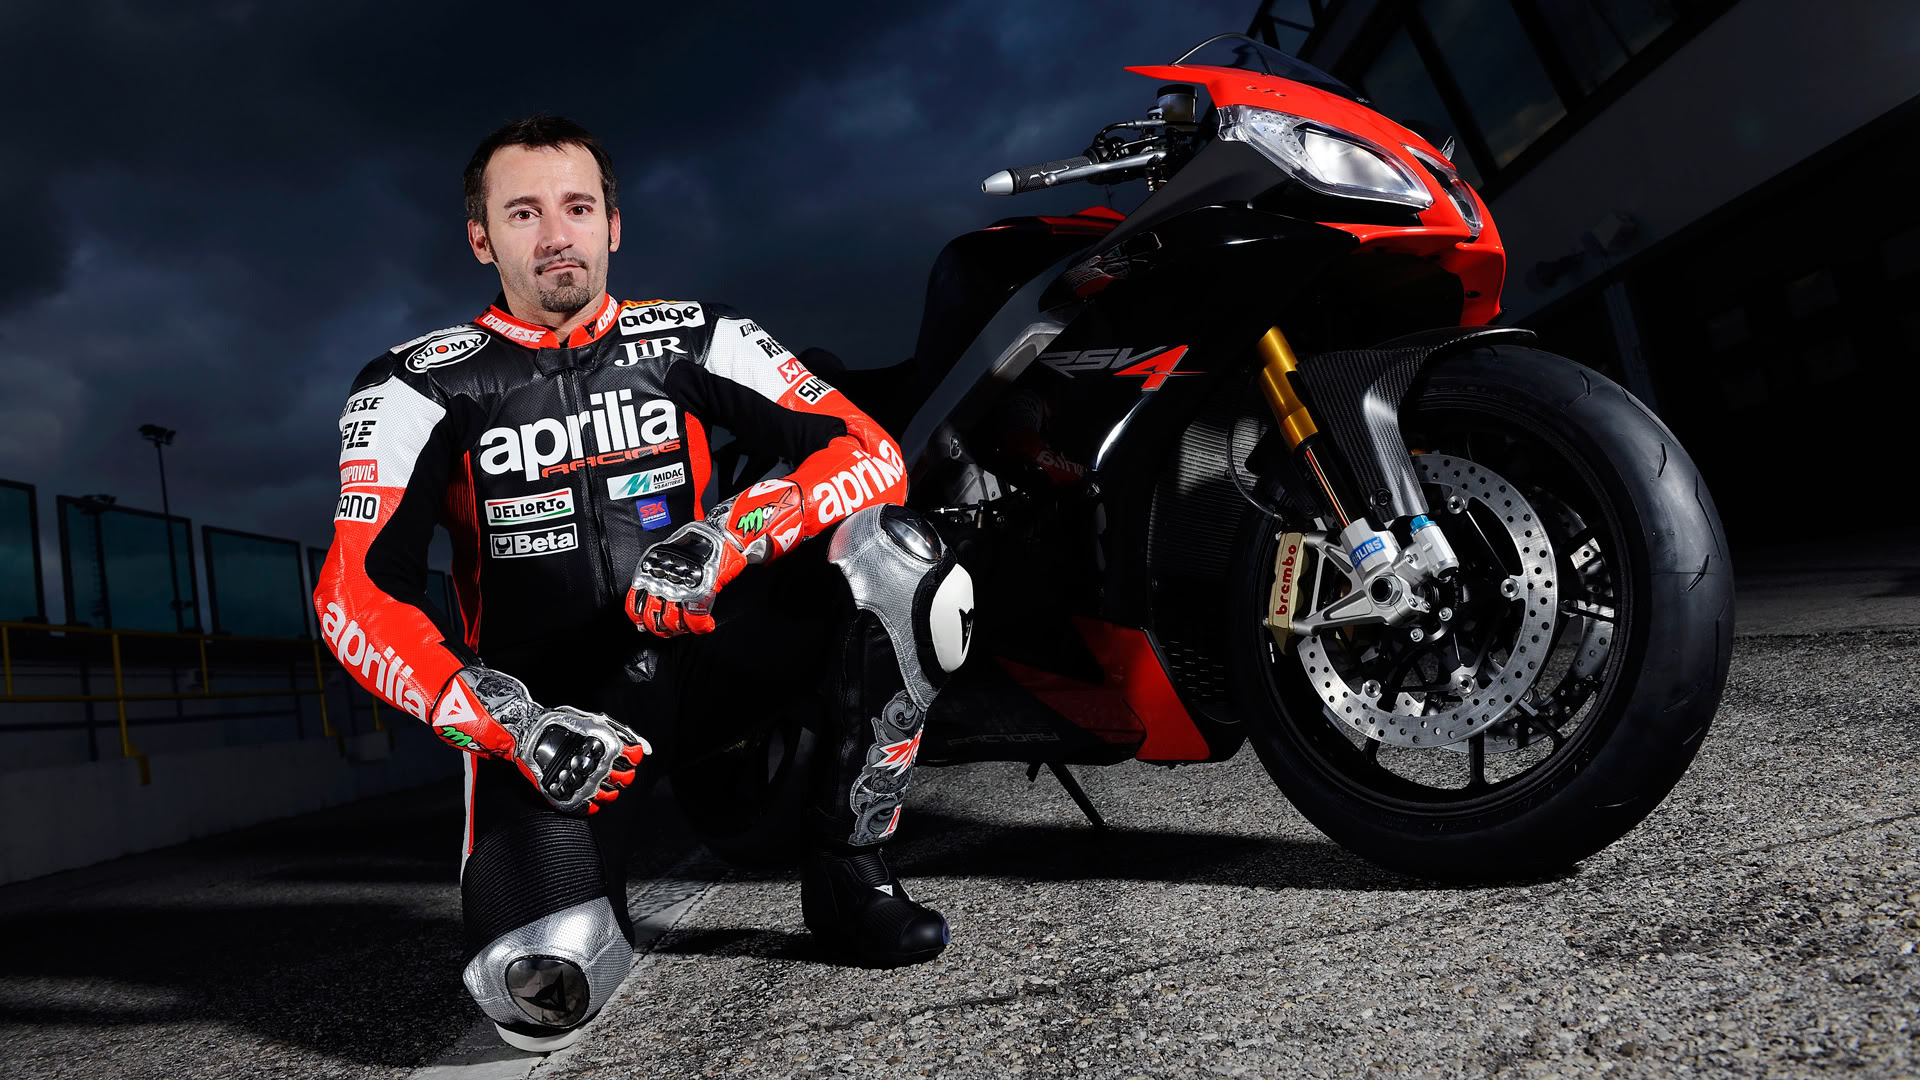 2103 MotoGP: Max Biaggi Test-Rides Ben Spies' Ducati - autoevolution